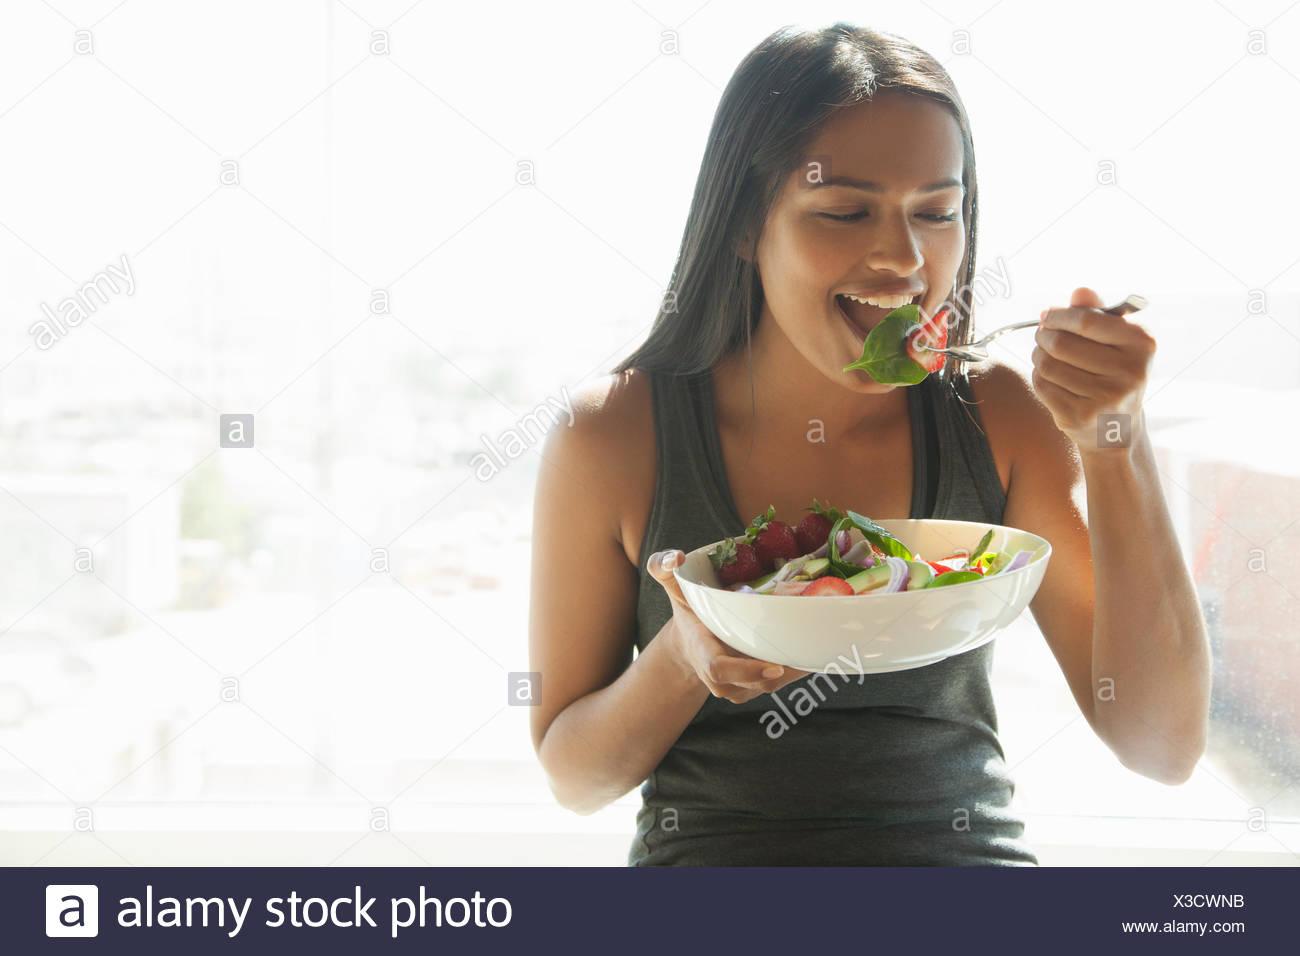 Woman eating salad at home - Stock Image